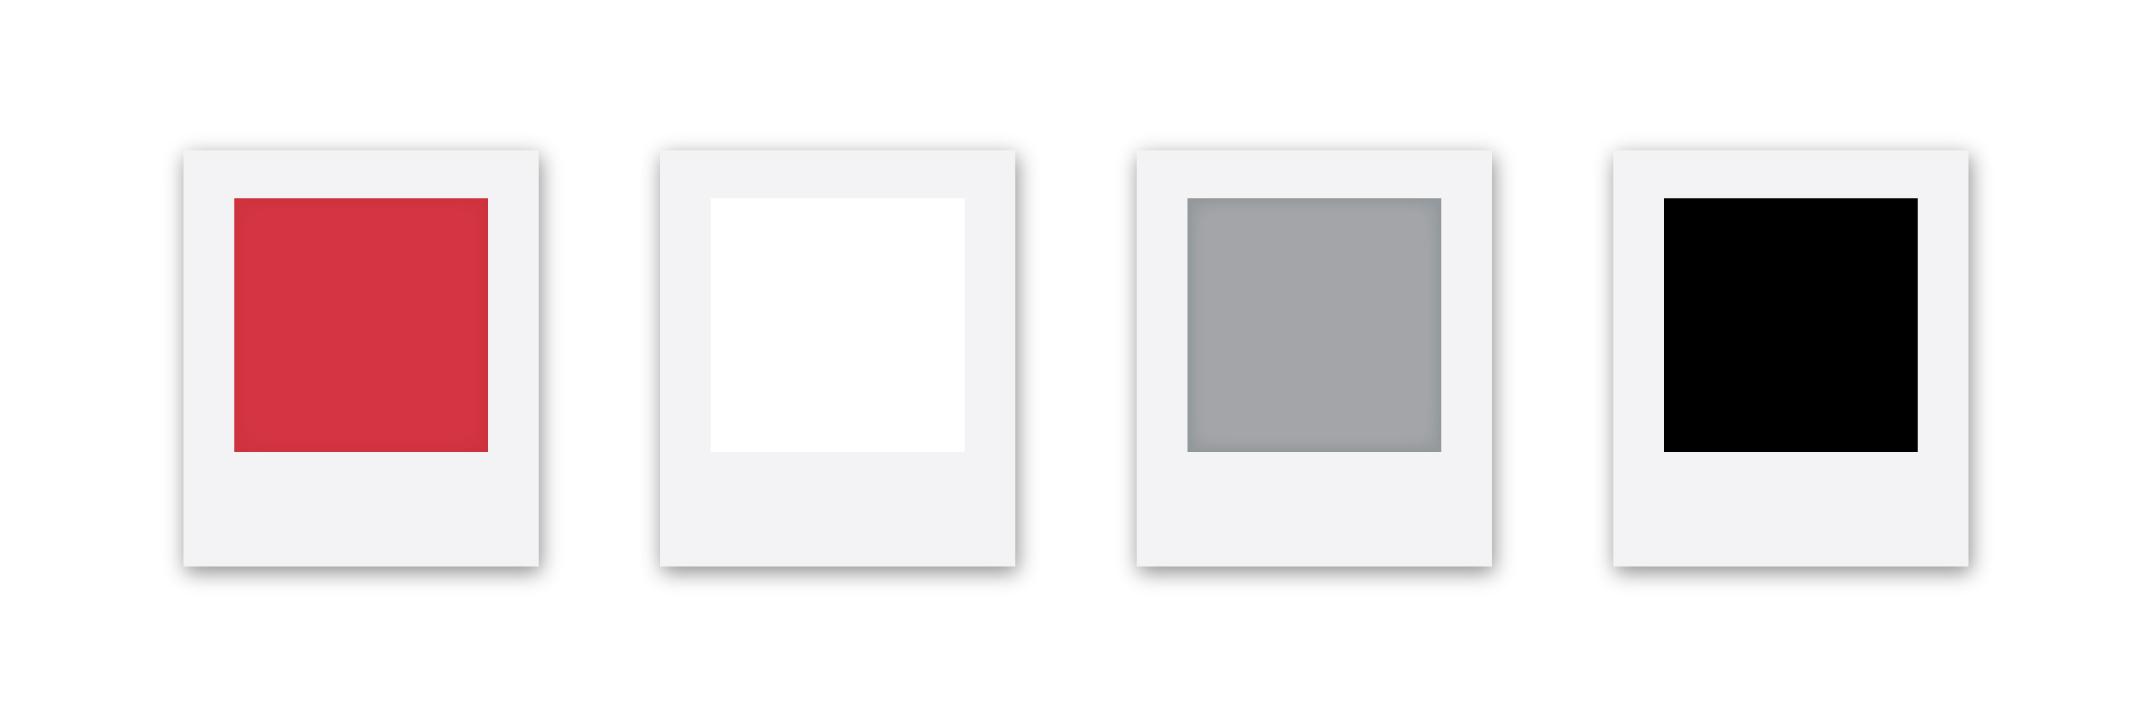 Target_Case-study-colors2.jpg